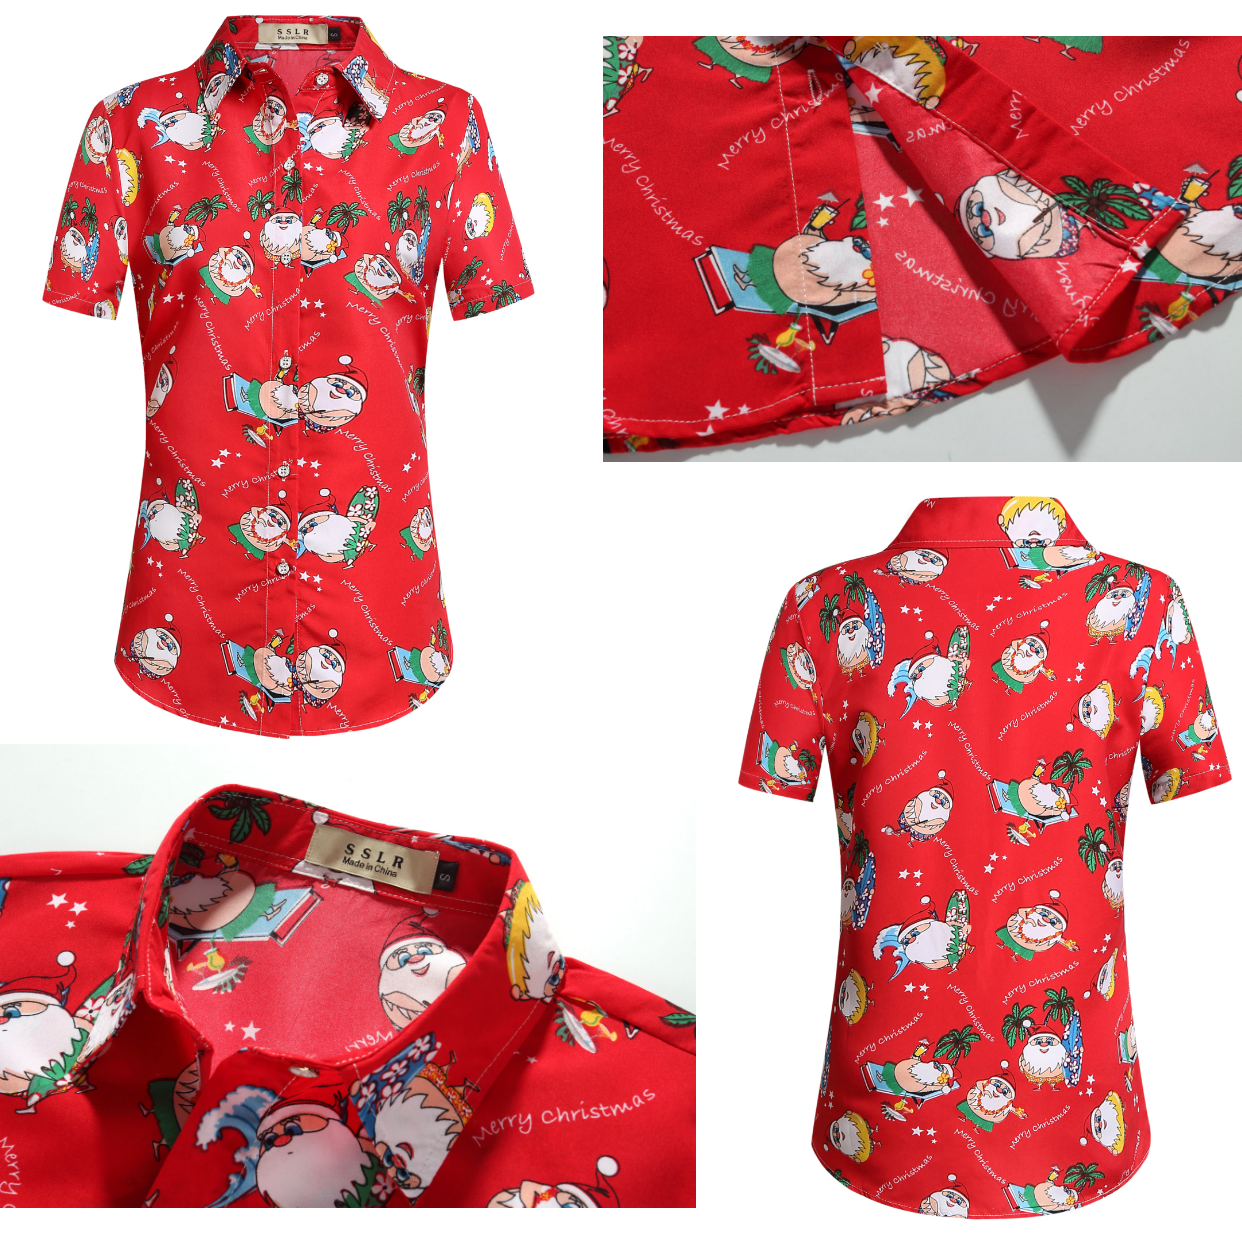 b45131db Blood Red Chirstmas Aloha Party Shirts #christmas shirts #hawaiian shirts  #red shirts